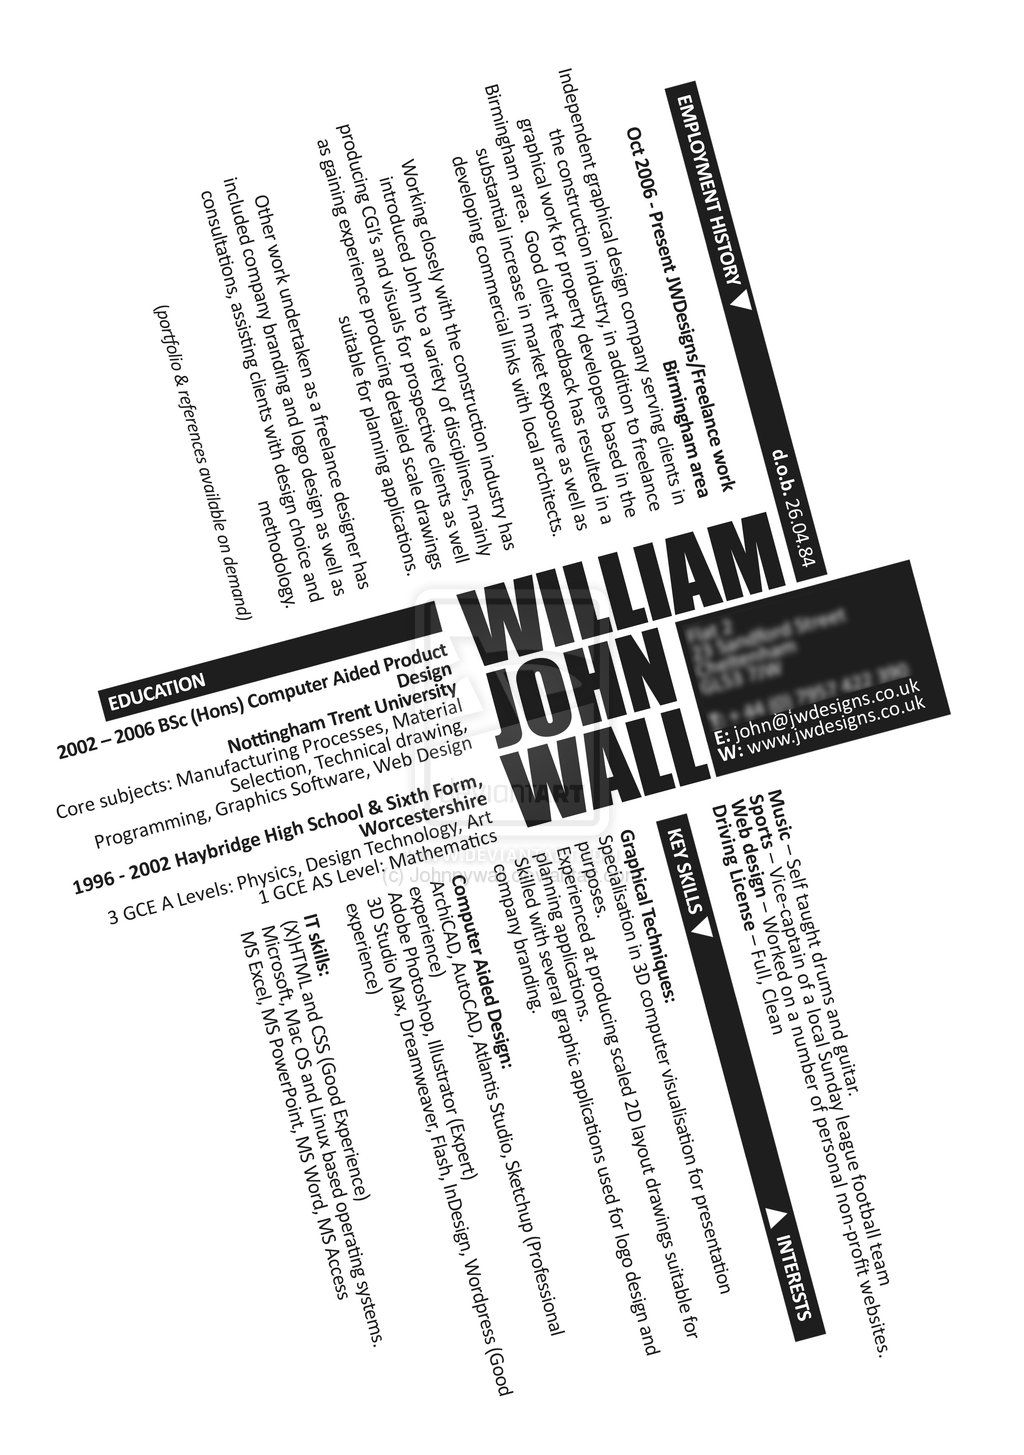 Cv By Johnnywall On Deviantart Resume Design Creative Clean Resume Design Resume Design